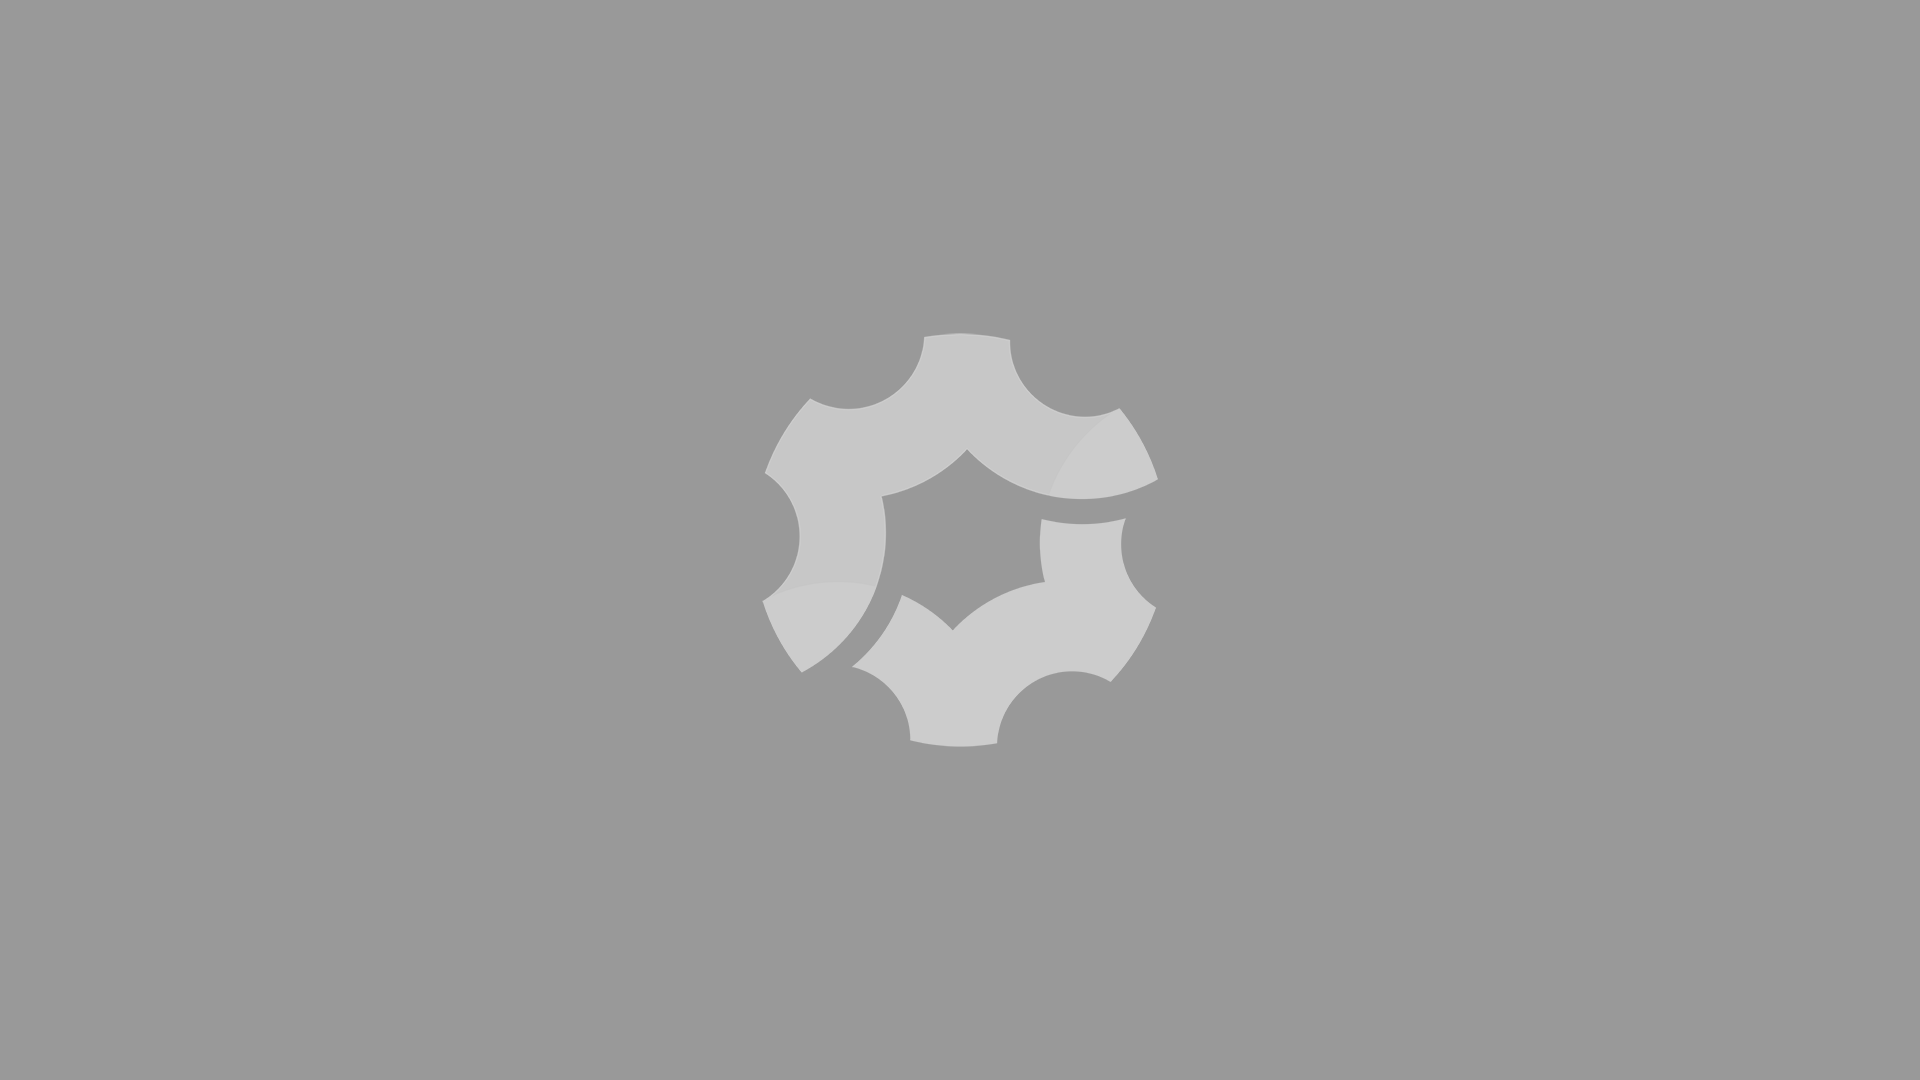 Unity Plugin app for Mod Support - mod io